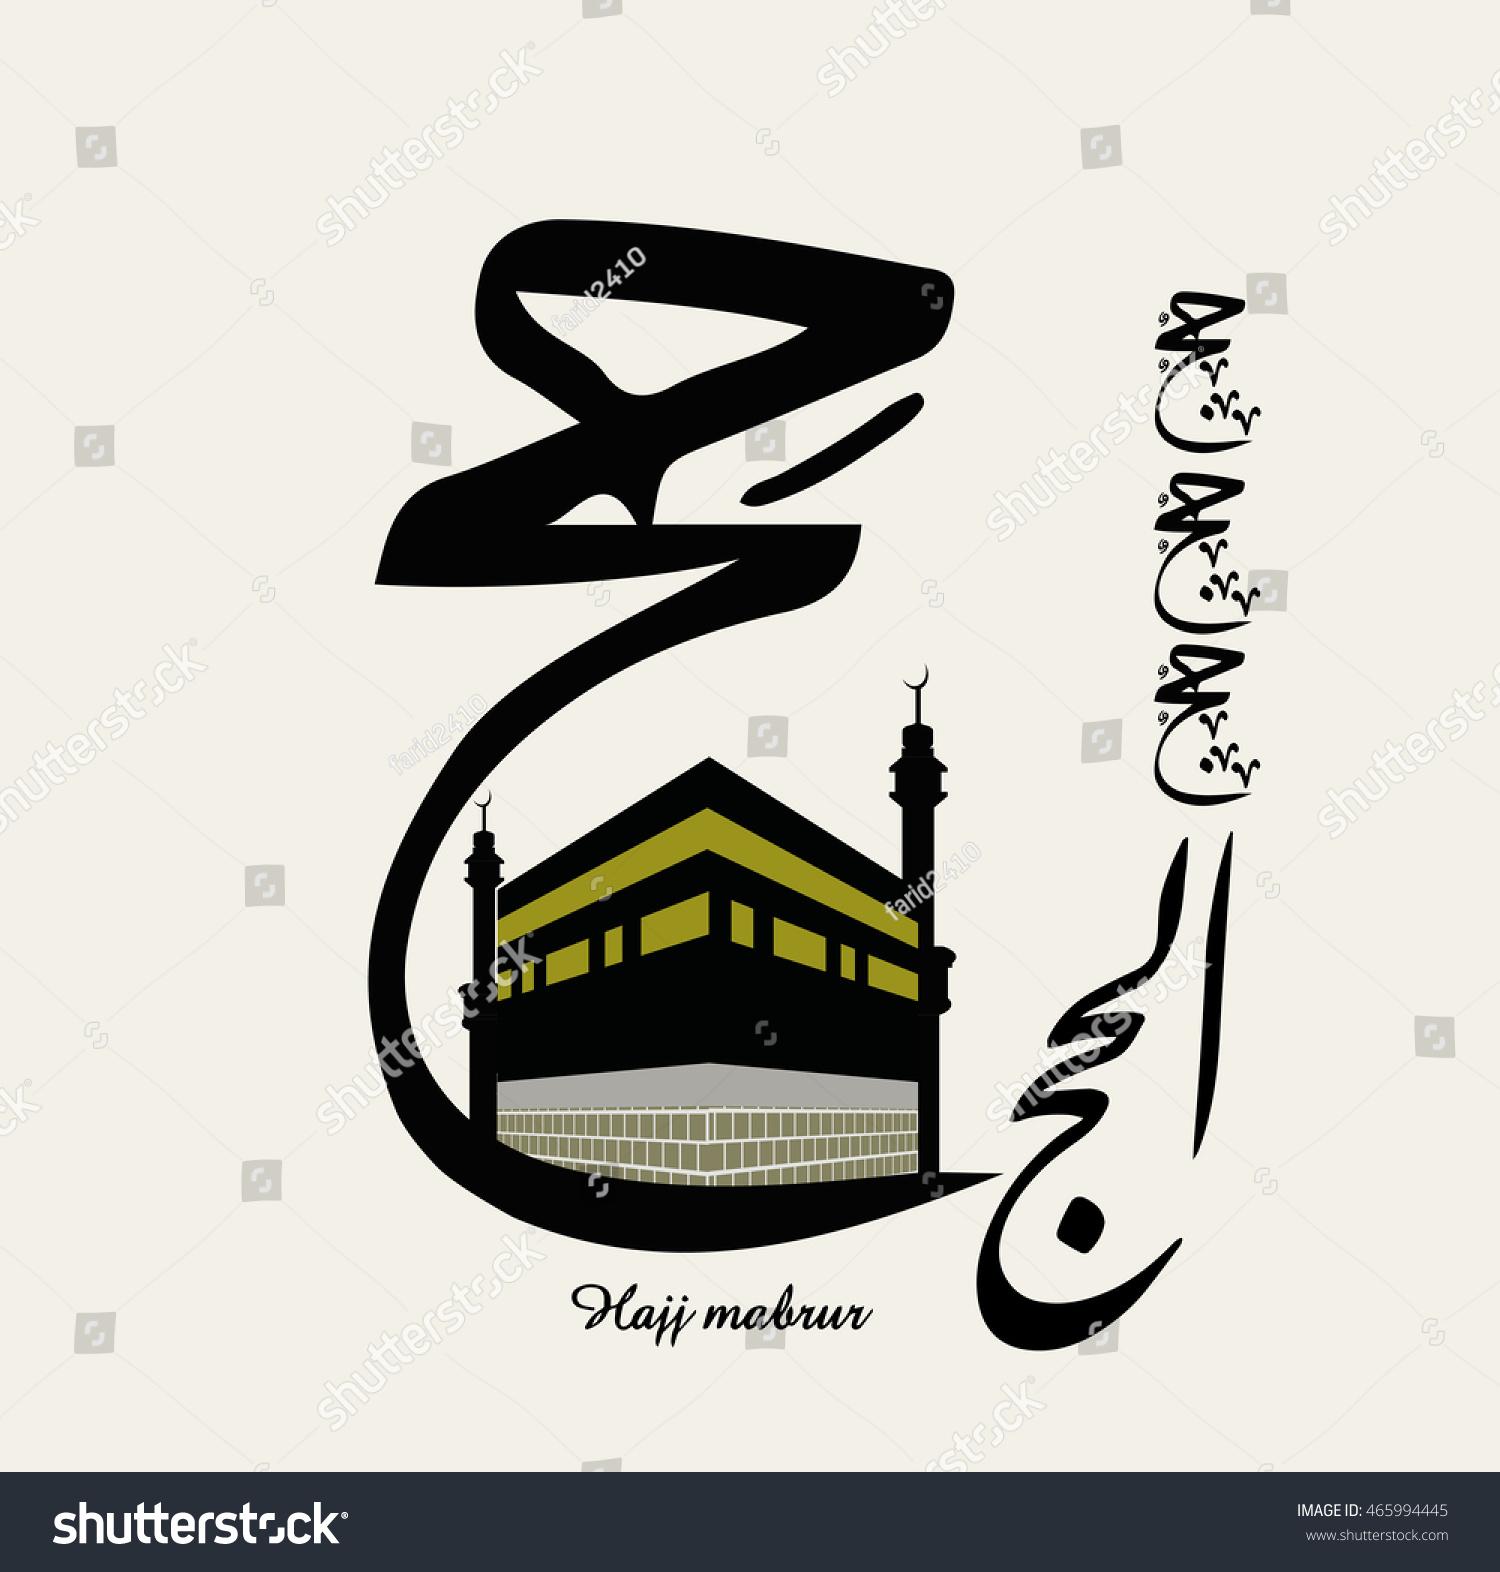 Arabic greeting words hajj mabrur calligraphytranslated stock arabic greeting words hajj mabrur calligraphyanslated as accepted pilgrimage it is a common kristyandbryce Choice Image